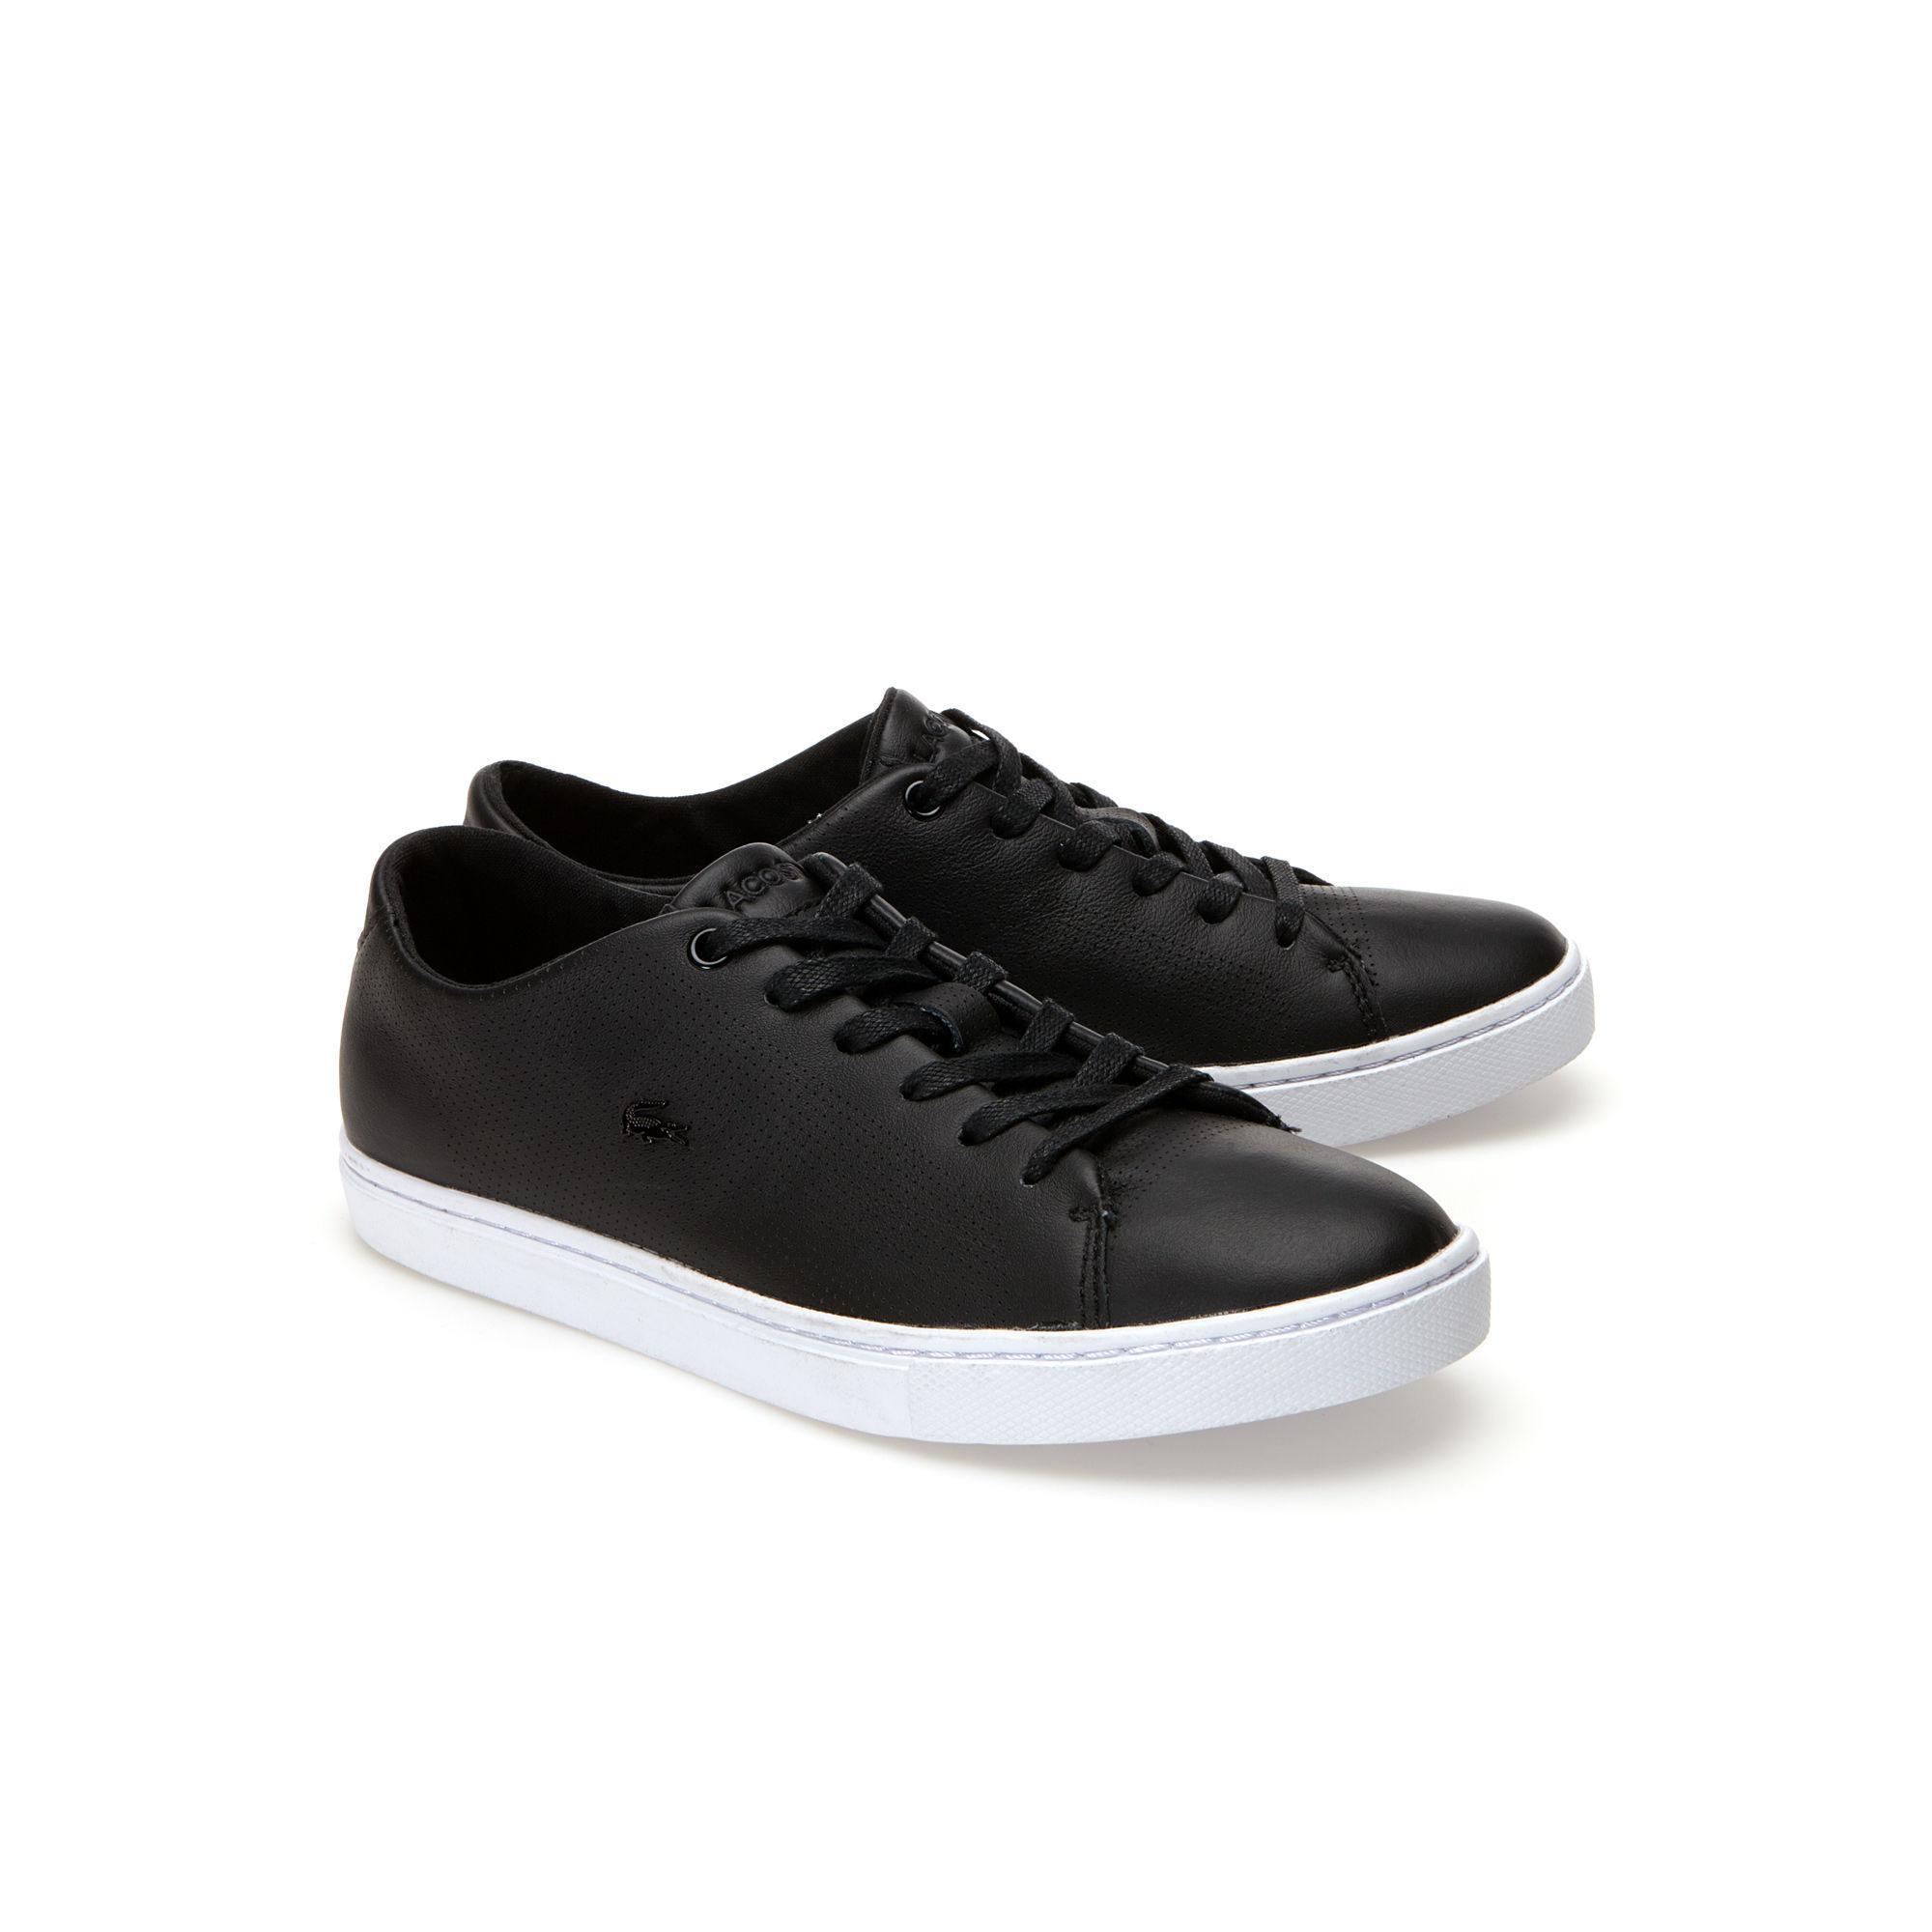 14f544e1609b6 ... Showcourt Leather Sneakers - Lyst. View fullscreen